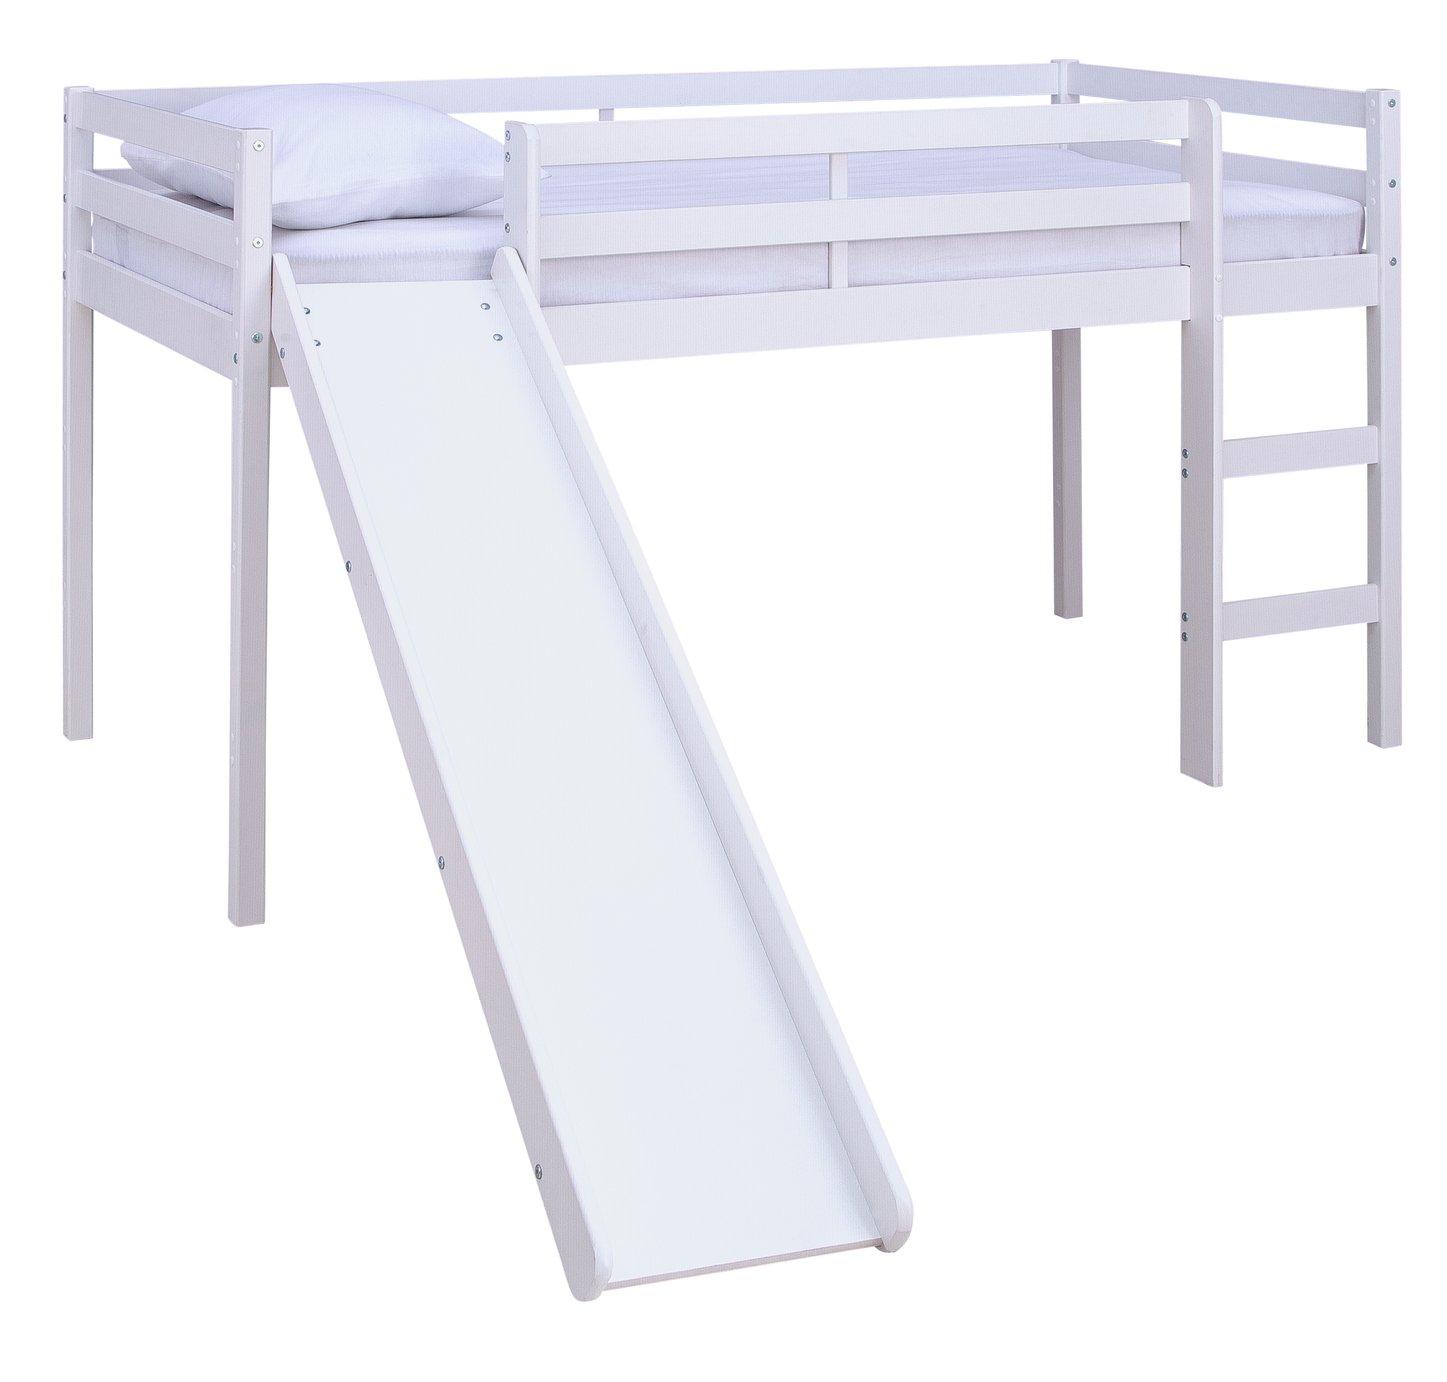 Argos Home Kaycie White Mid Sleeper with Slide